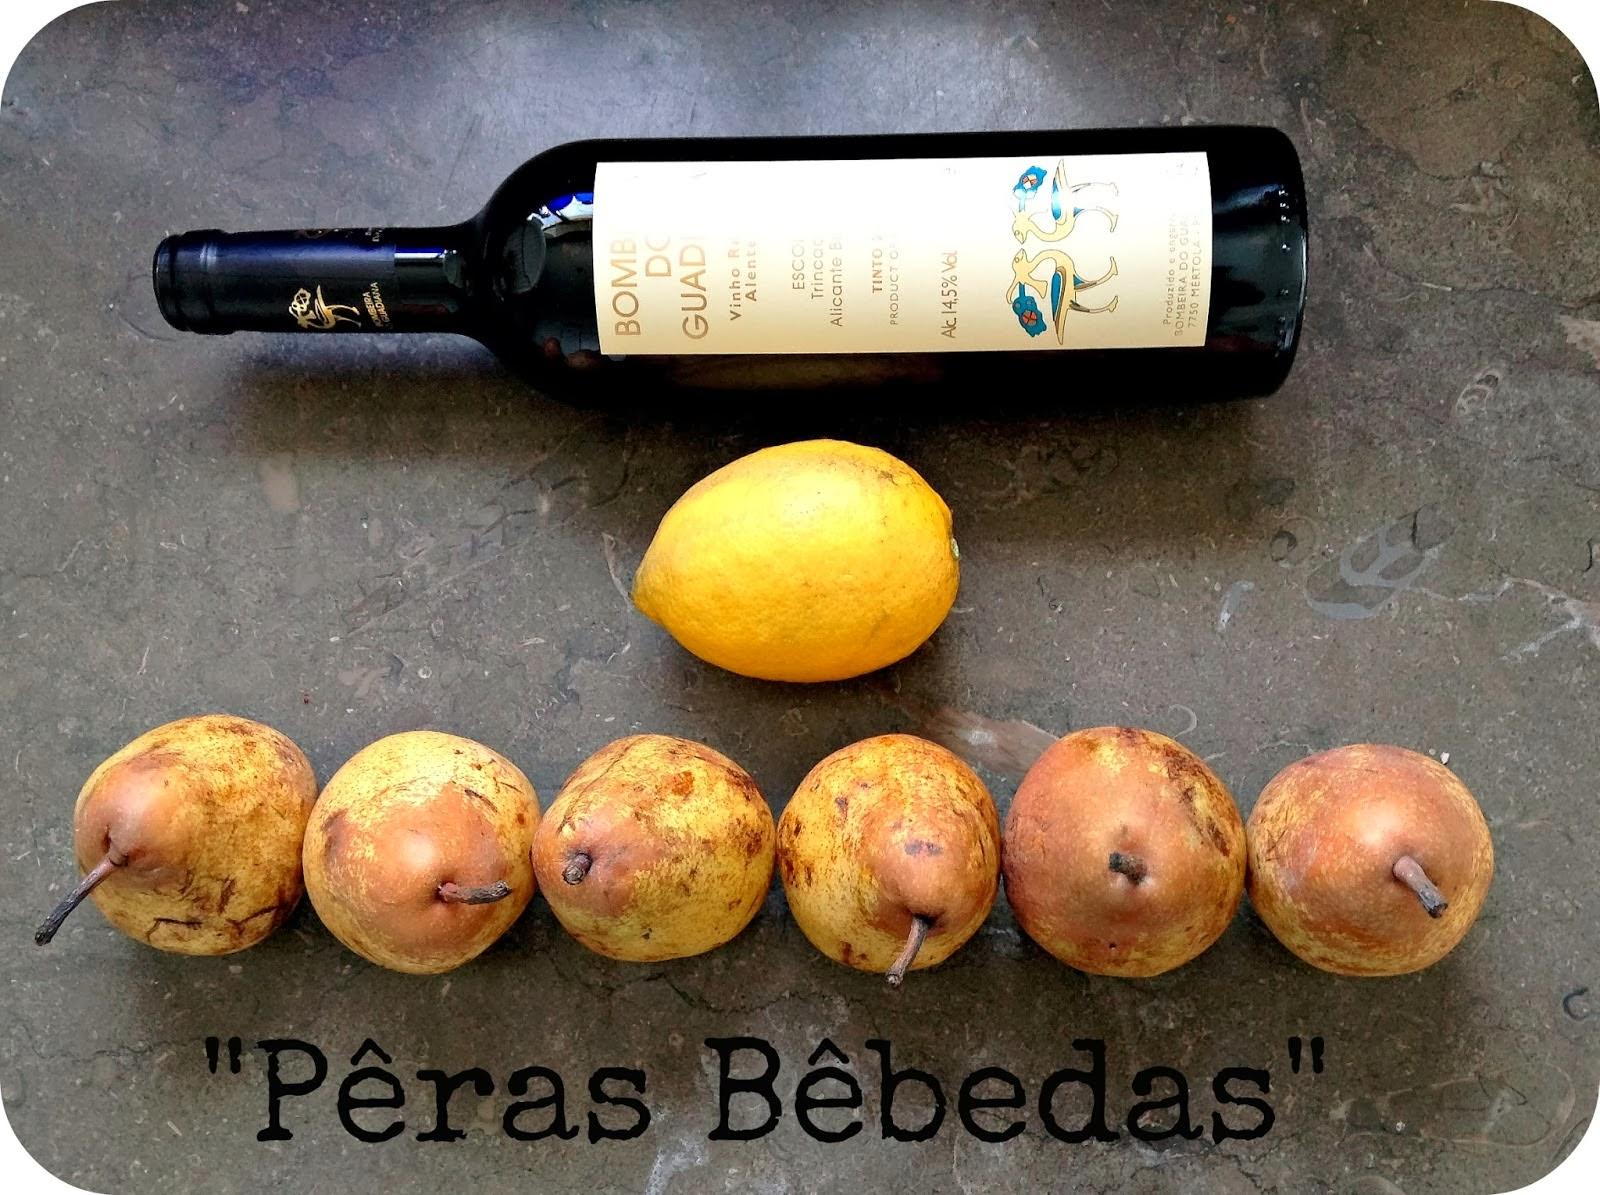 http://coisasdefazer.blogspot.pt/2014/03/peras-bebedas-drunk-pears.html